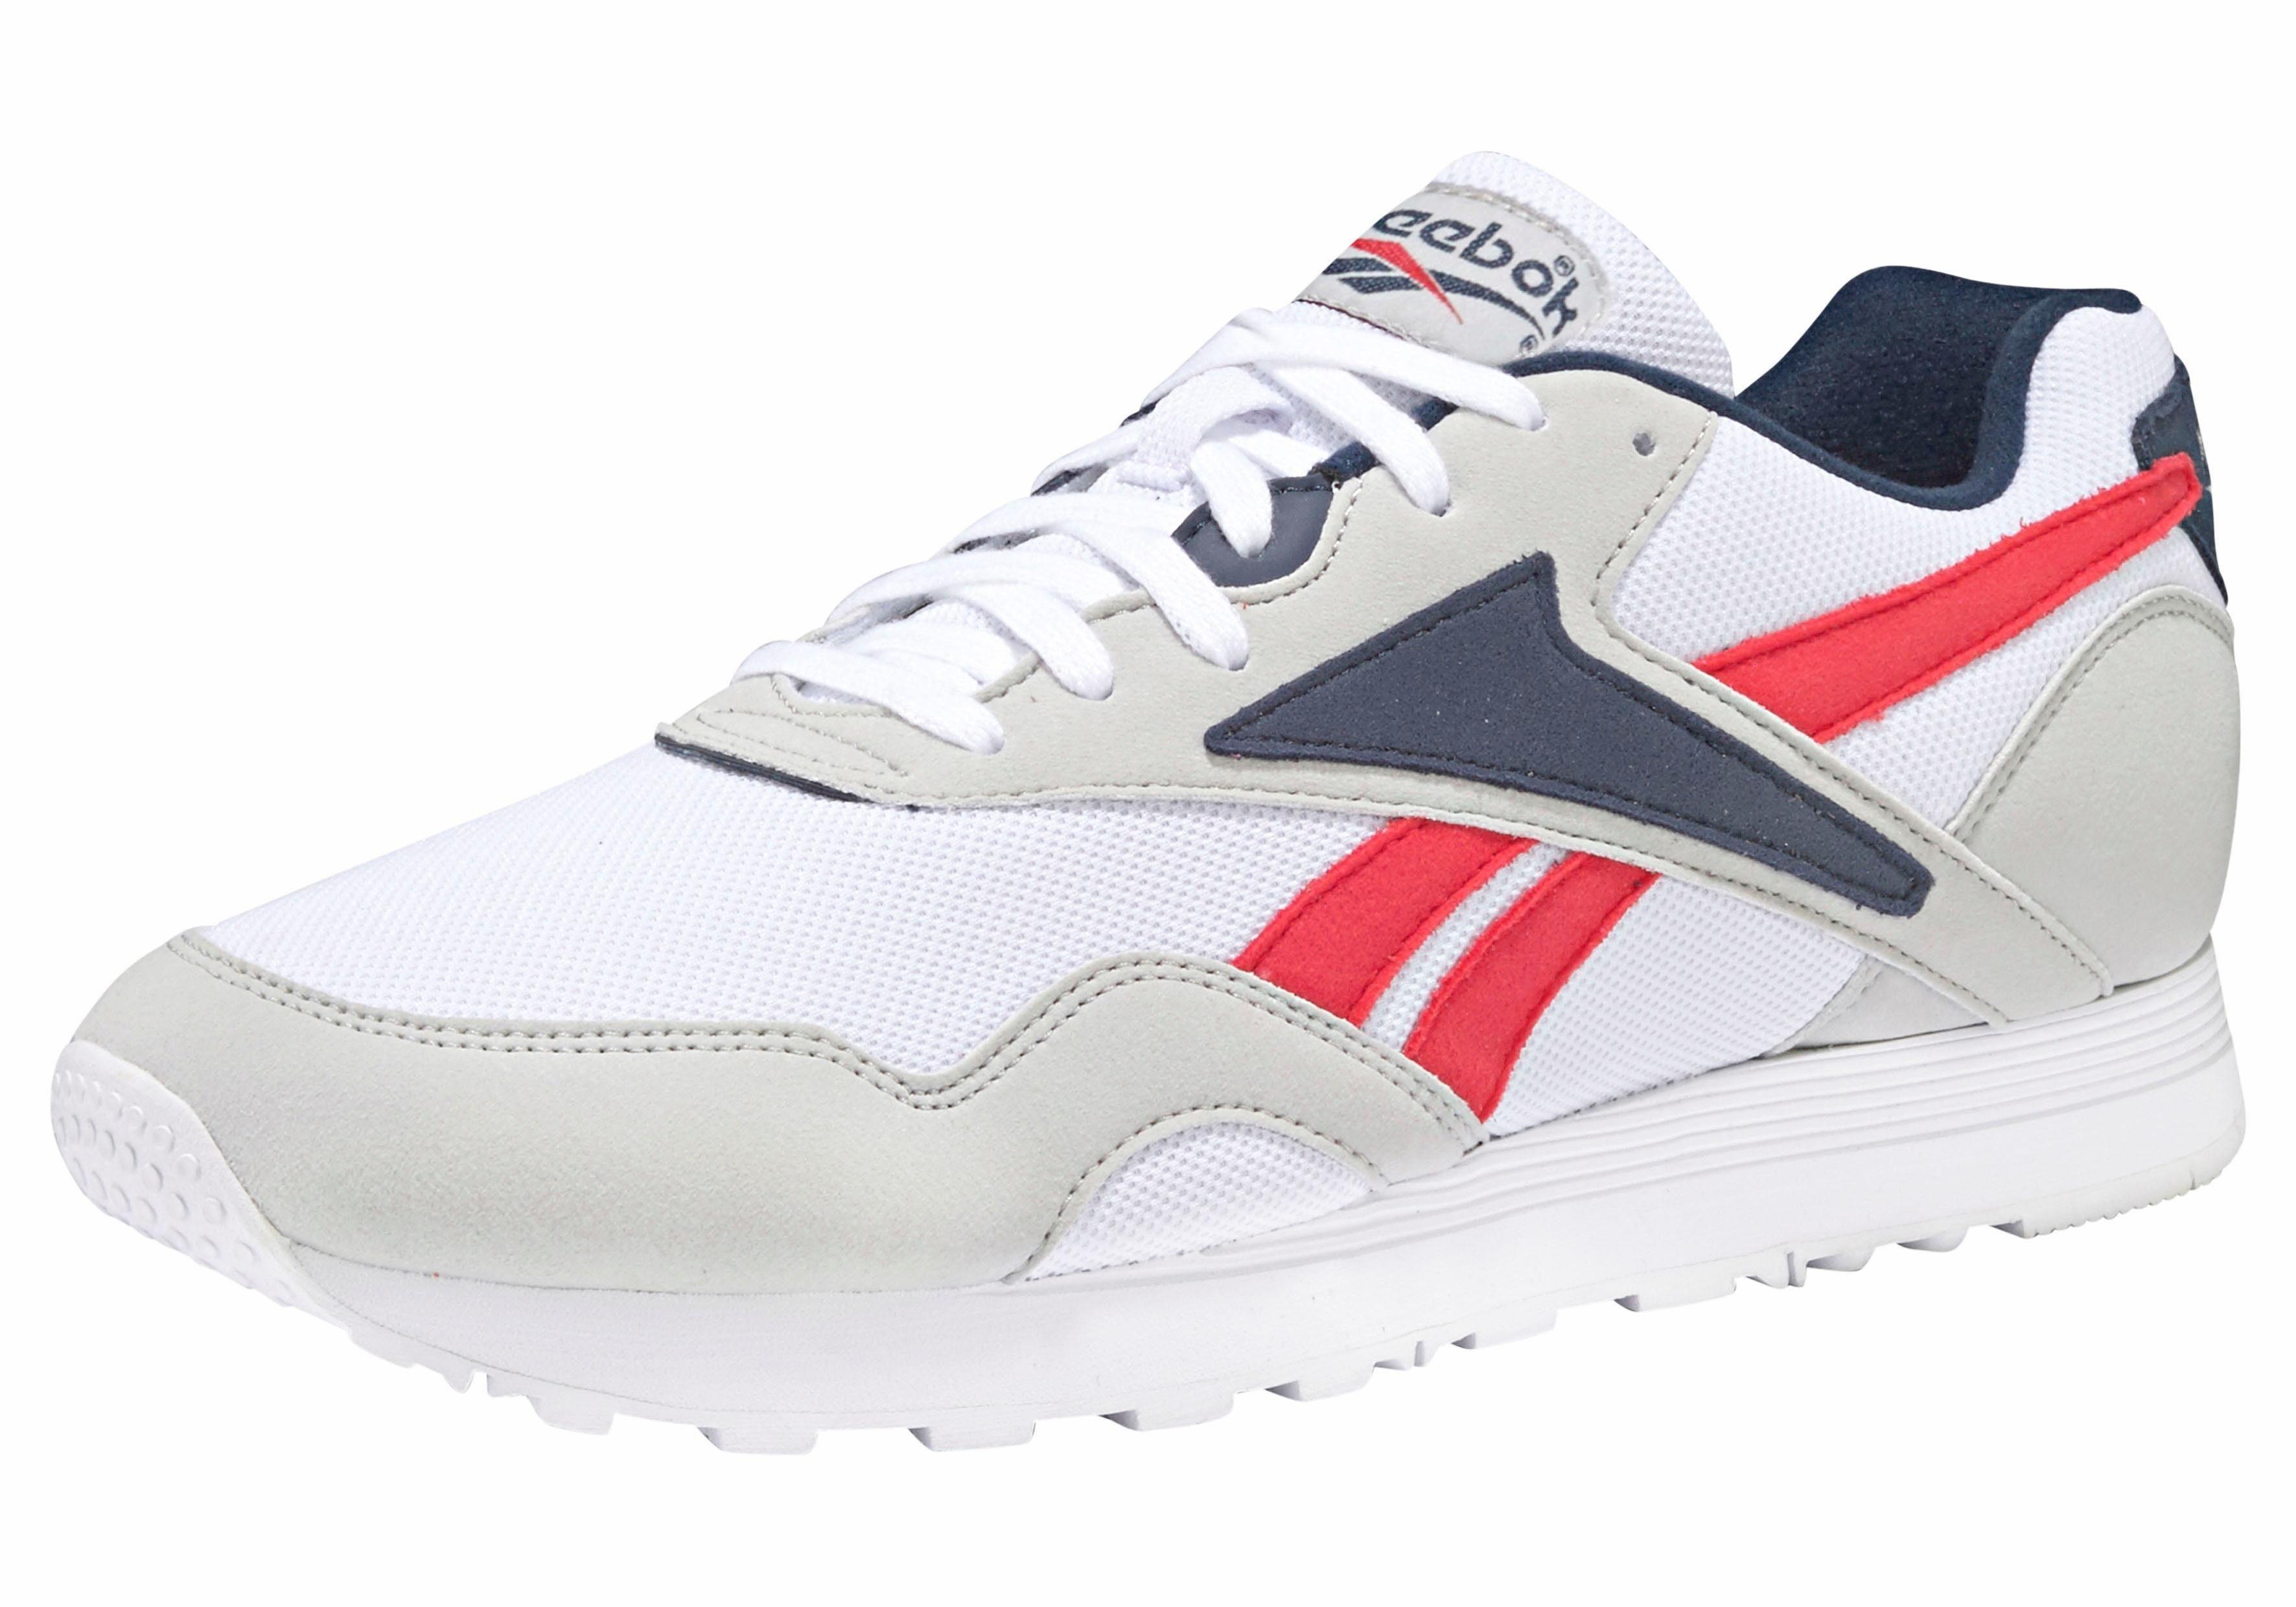 Reebok Classic »Rapide MU« Sneaker, Cooler Obermaterialmix aus Synthetik und Textil online kaufen | OTTO